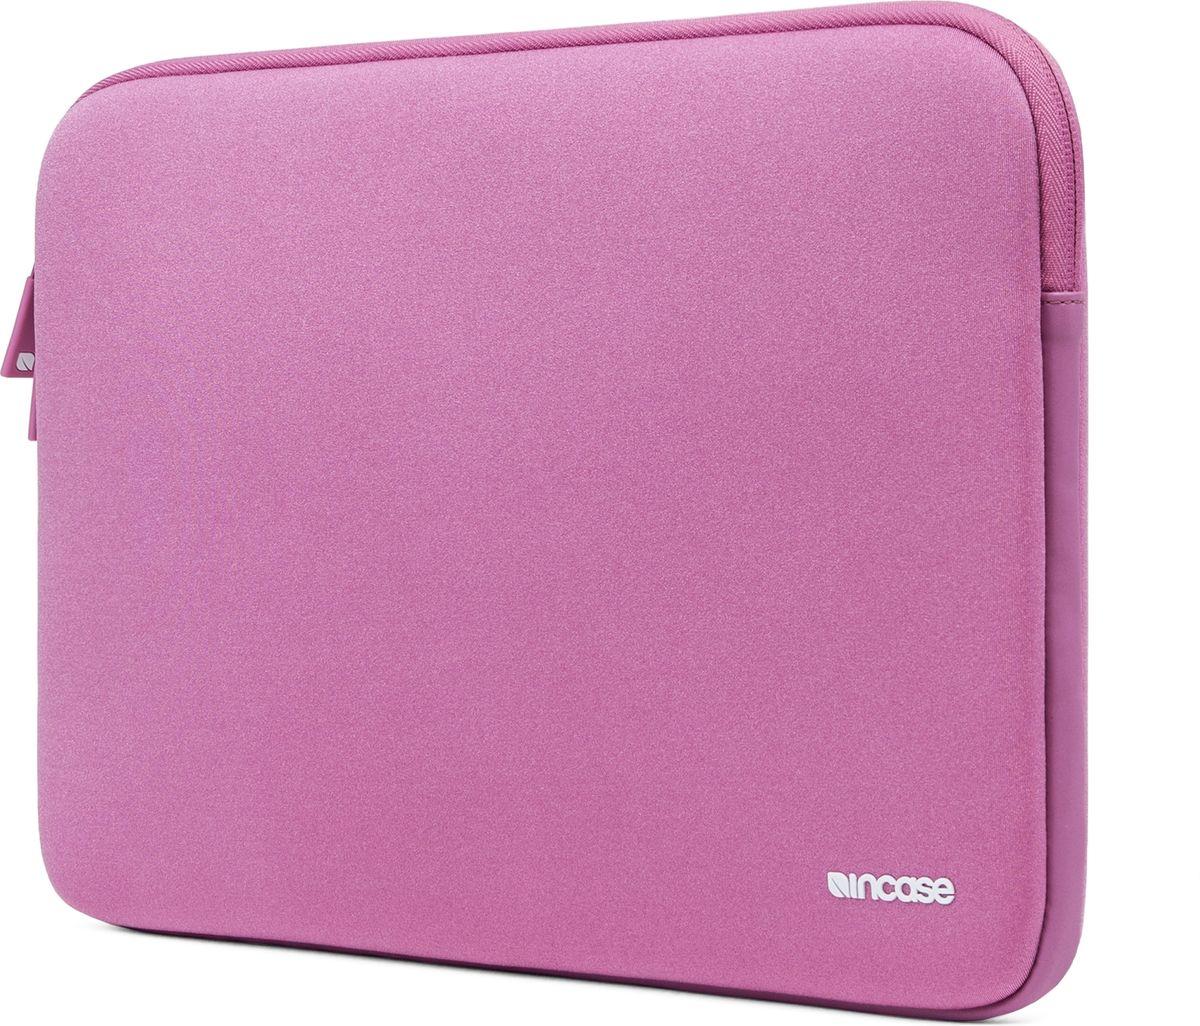 "Incase Neoprene Classic Sleeve чехол для Apple MacBook Air 11"", Orchid CL90041"